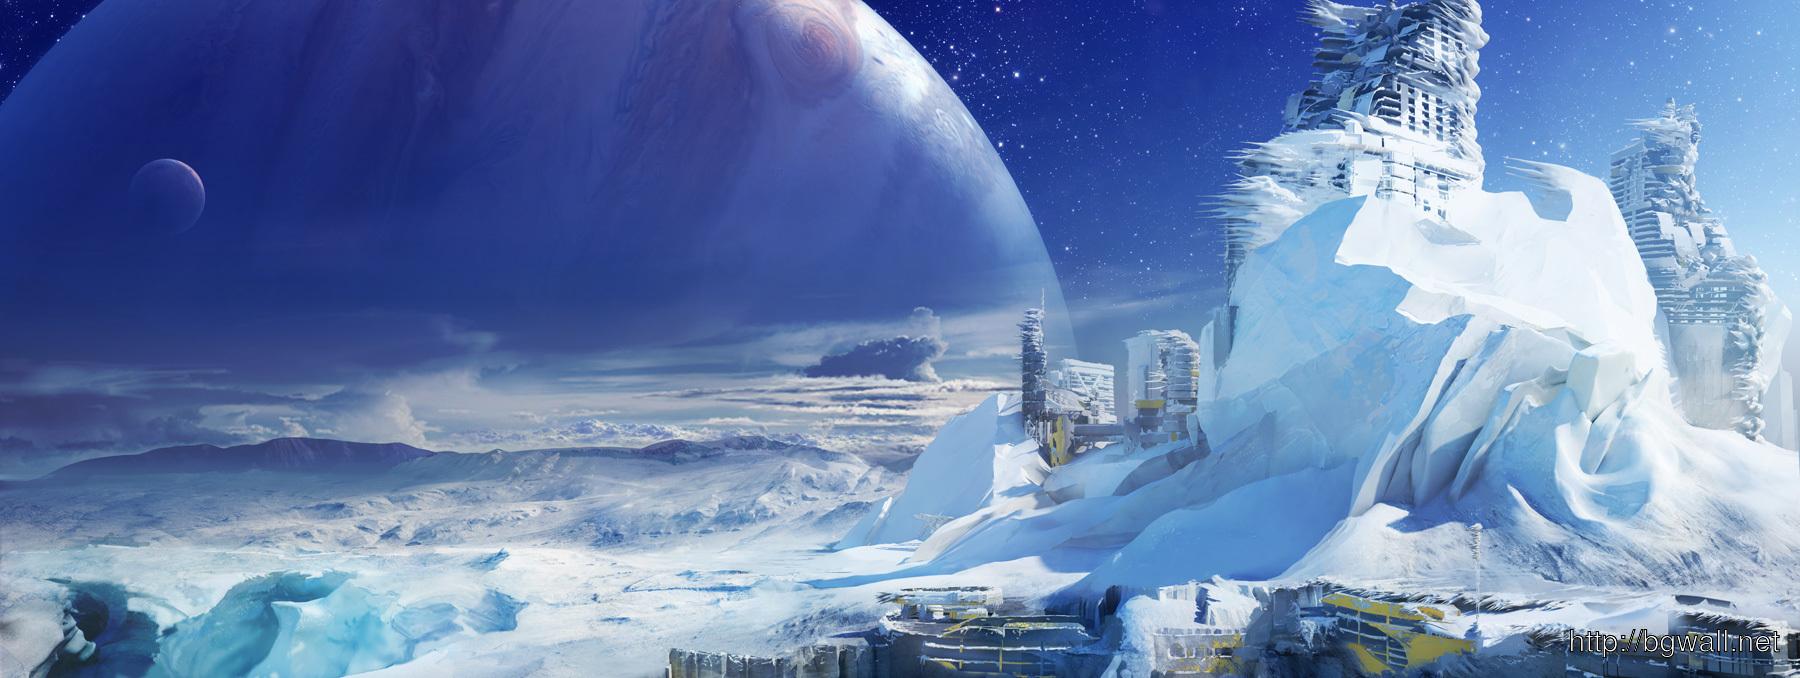 destiny video games wallpaper - photo #25